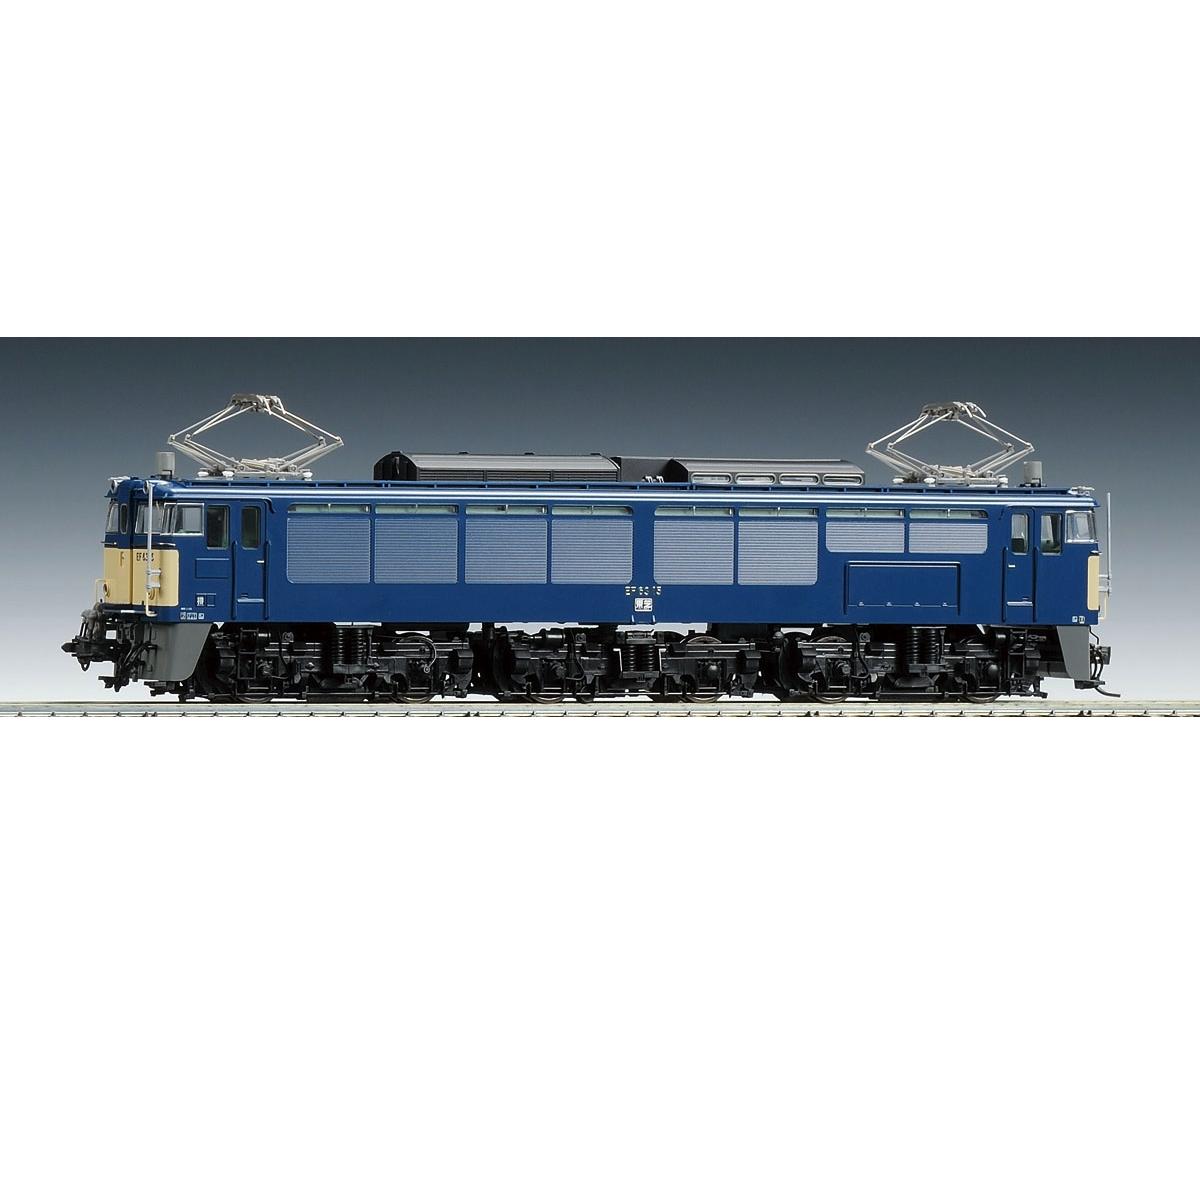 Tomix HO-144 Electric Locomotive JR Type EF63 (second edition) - HO